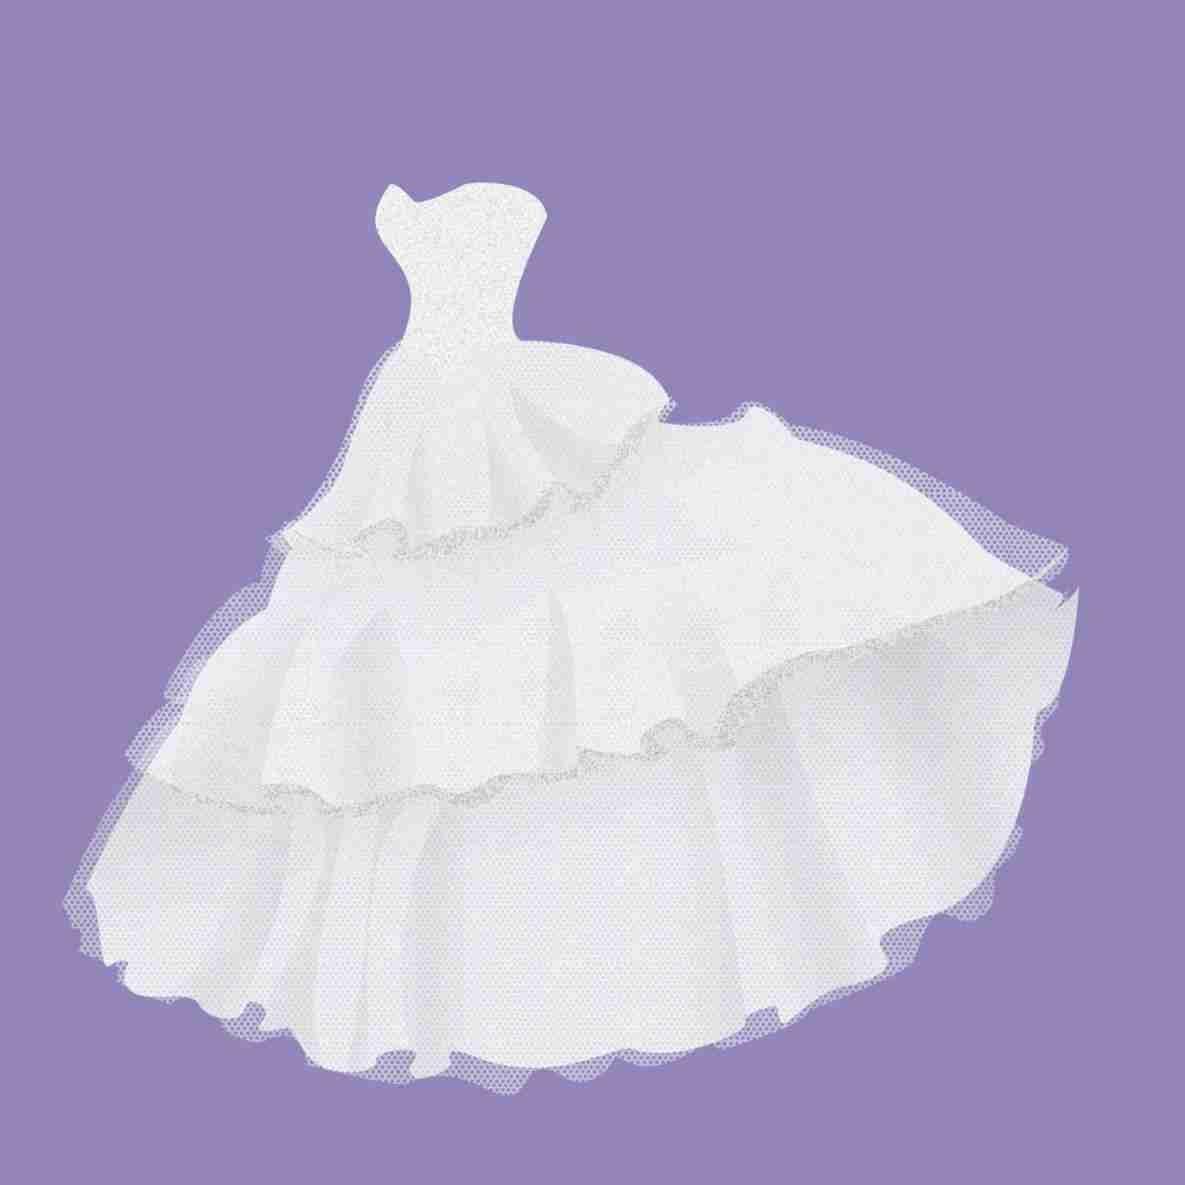 New Post wedding dress clipart png | Weddings | Pinterest | Wedding ...